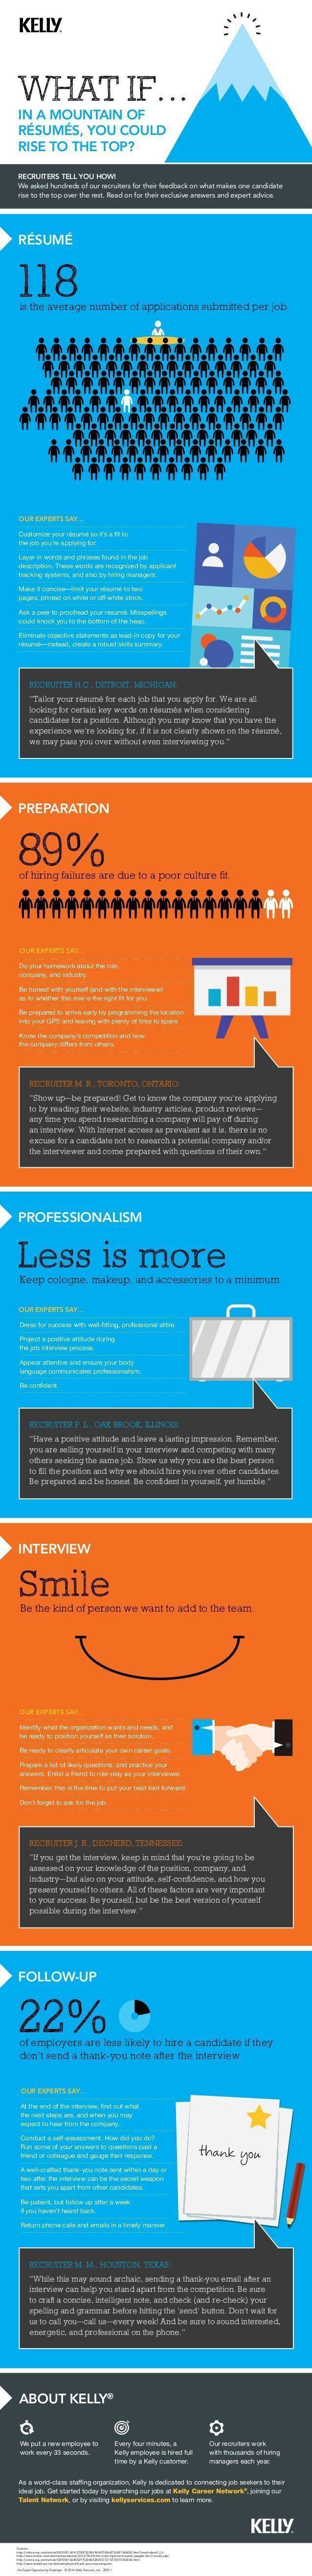 infographic infographic infographic infographic